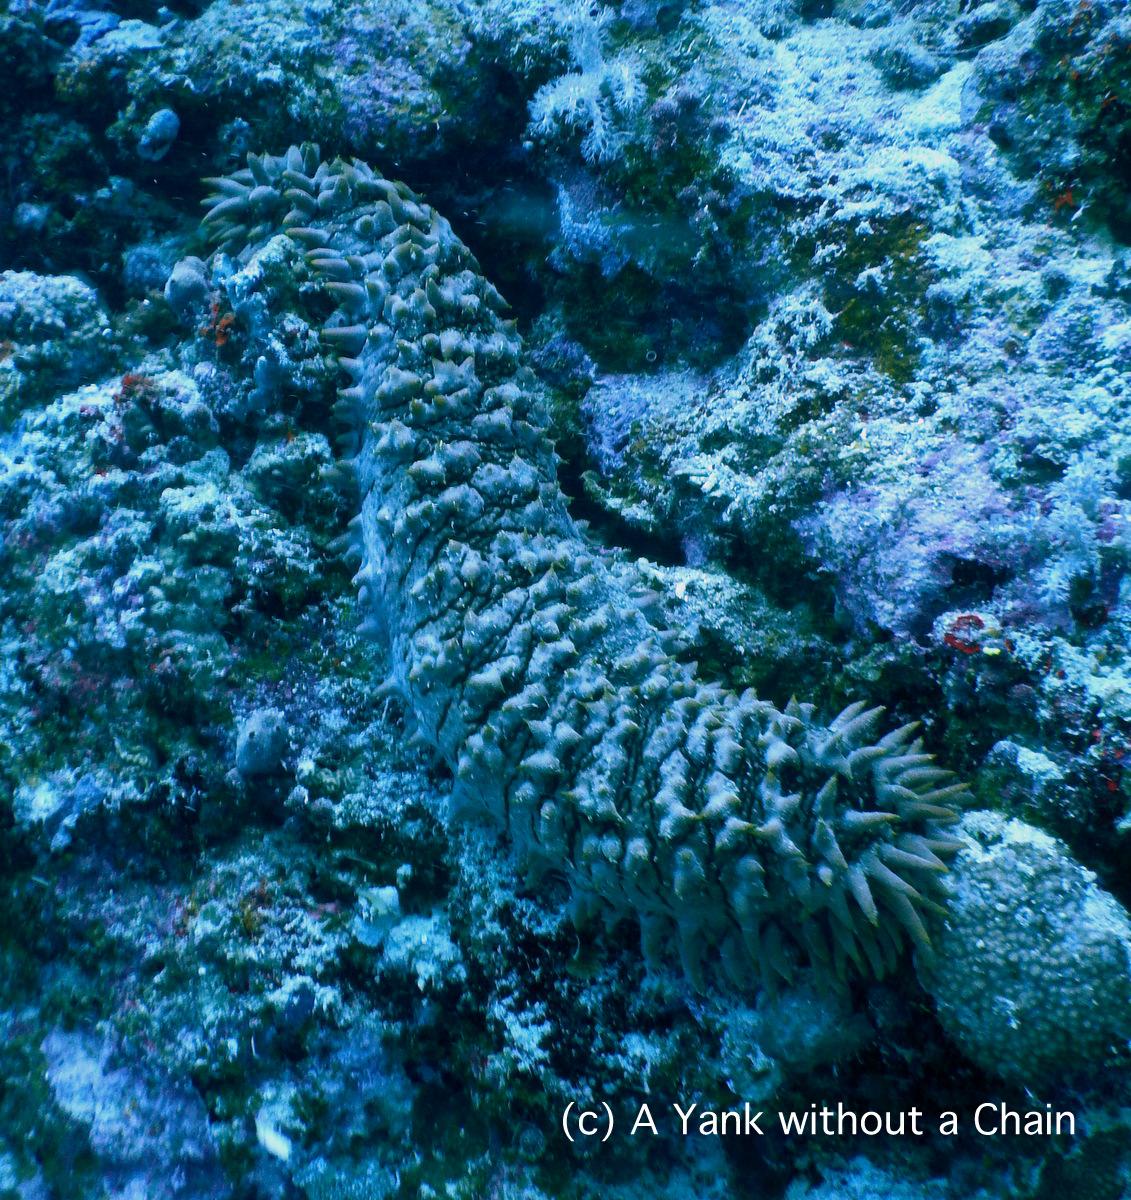 A pineapple sea cucumber at Pixie's Pinnacle